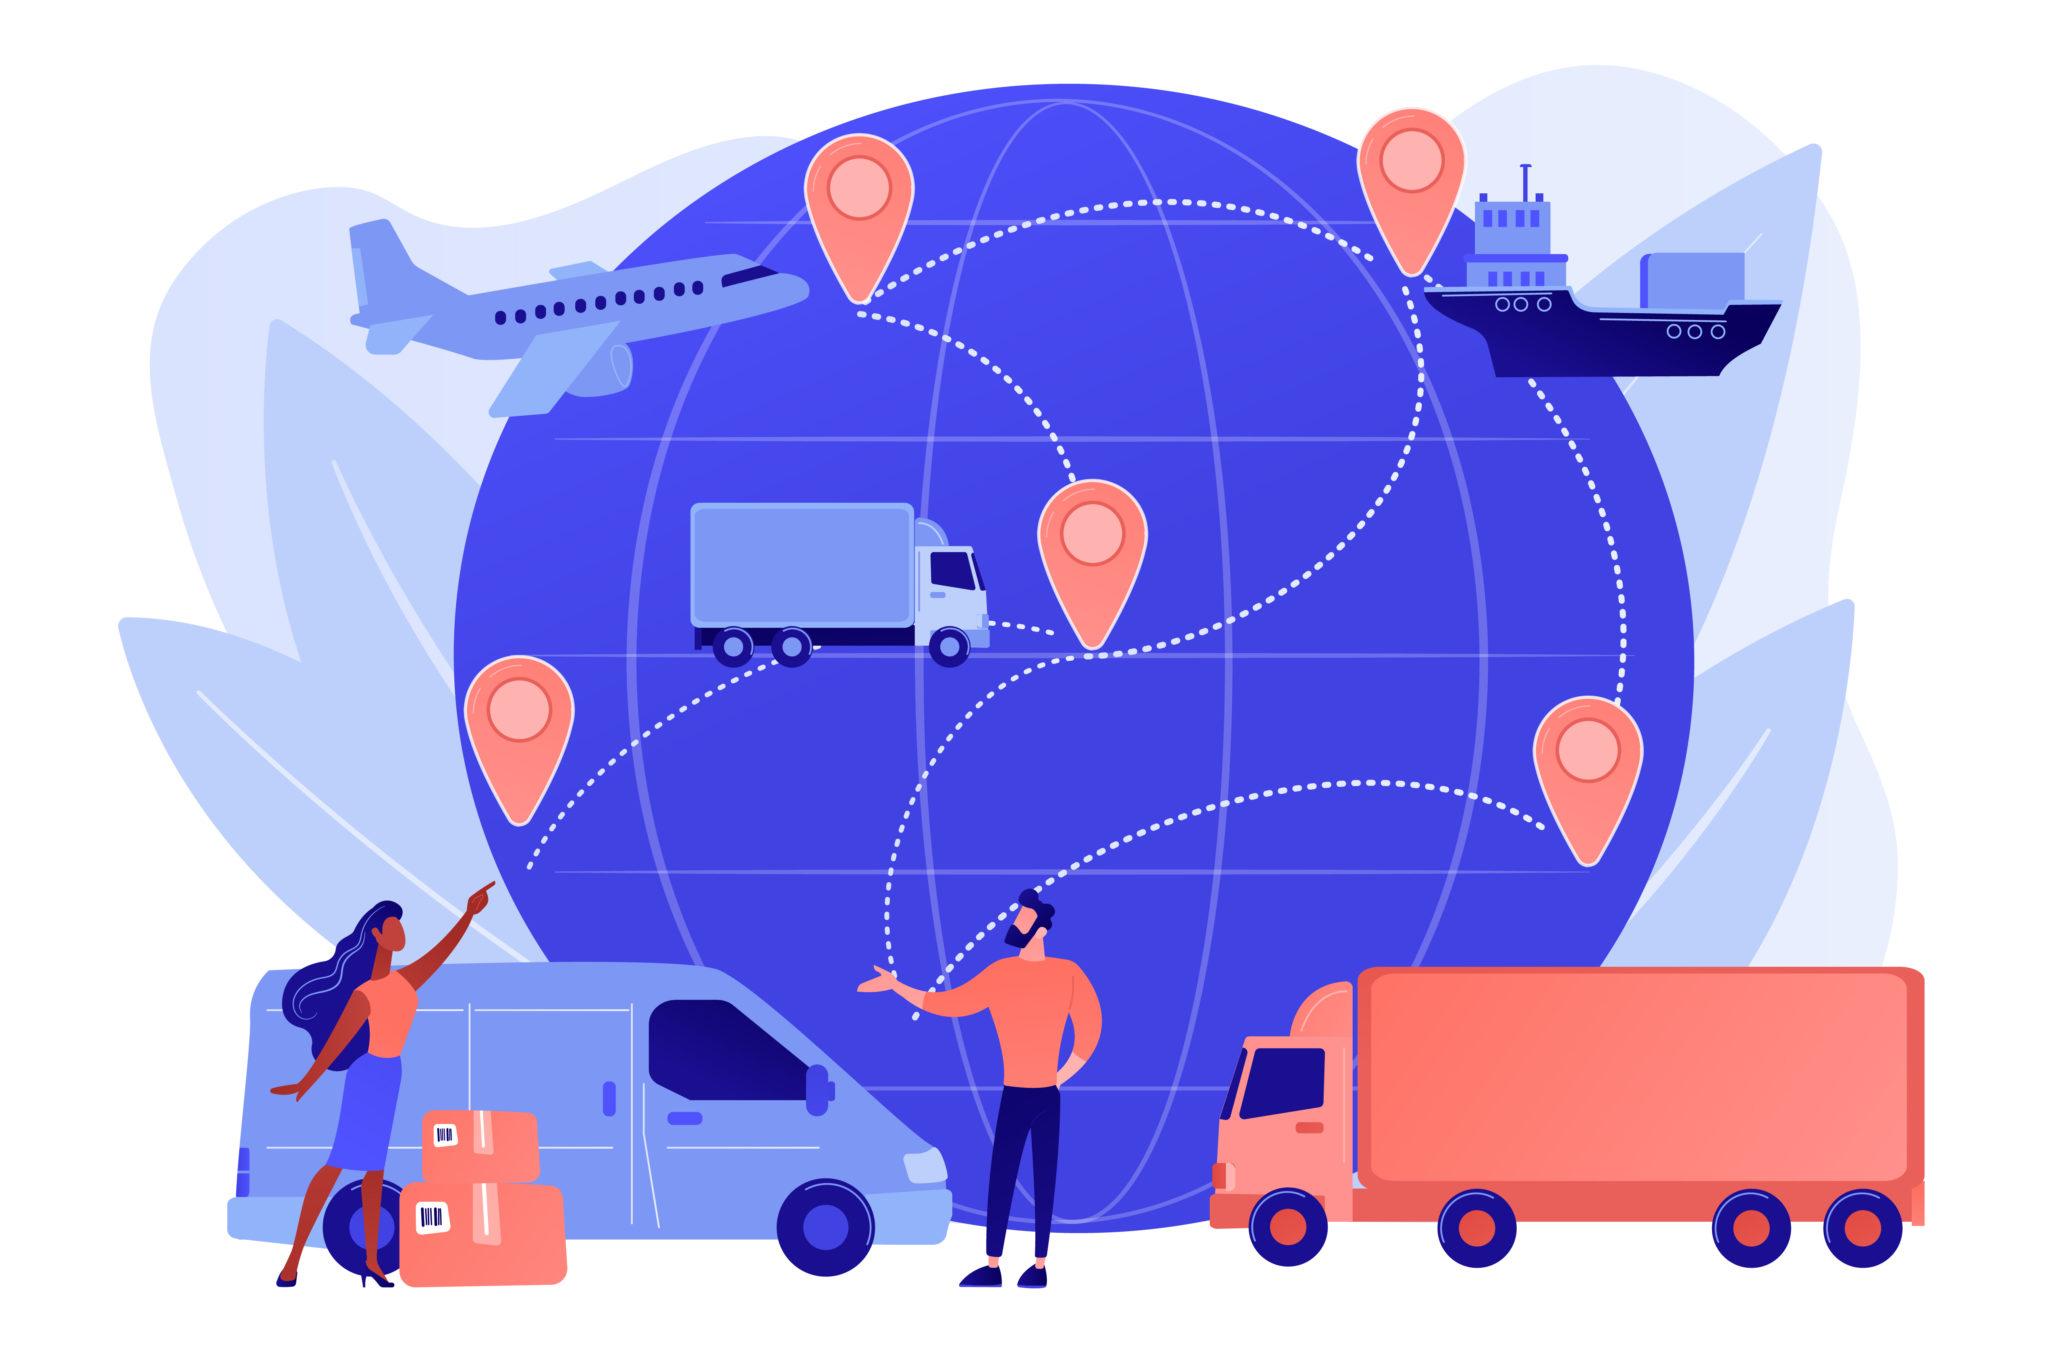 image-global-shipping-refurbished-apple-product